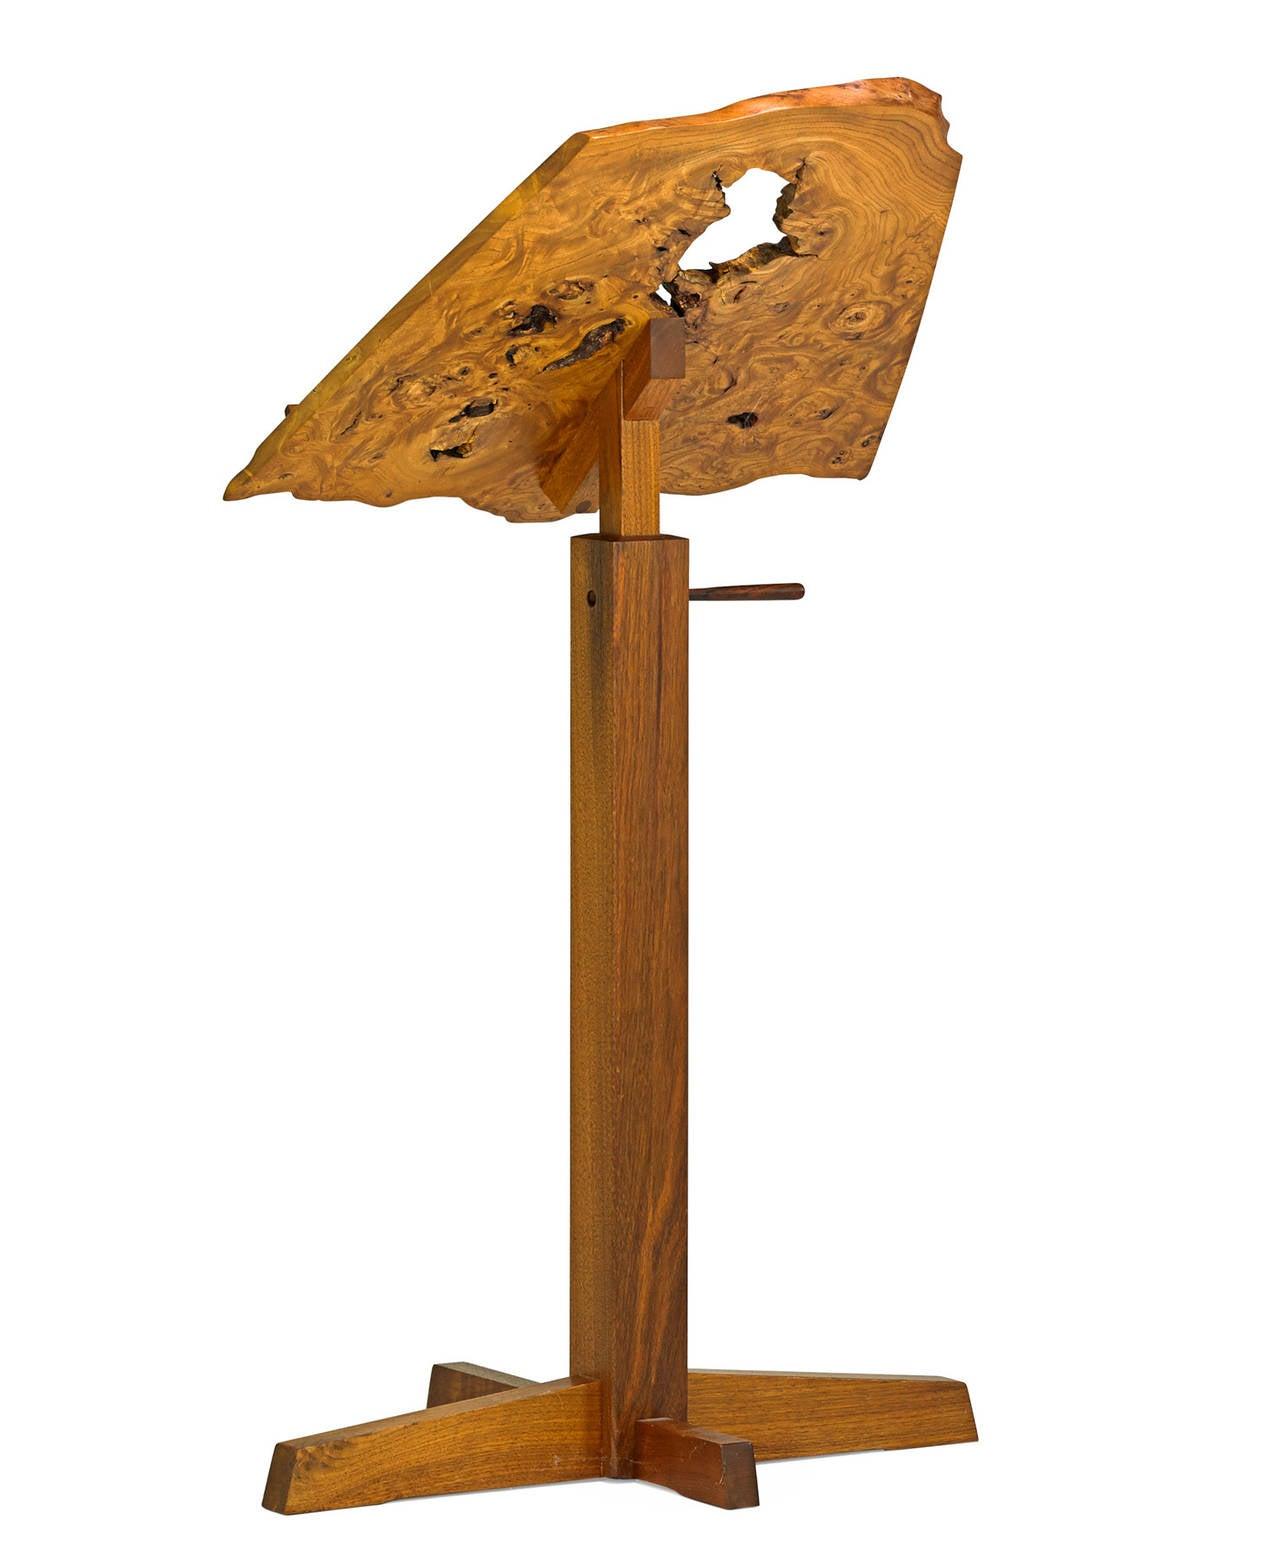 Adjustable Music Stand : george nakashima adjustable music stand for sale at 1stdibs ~ Hamham.info Haus und Dekorationen